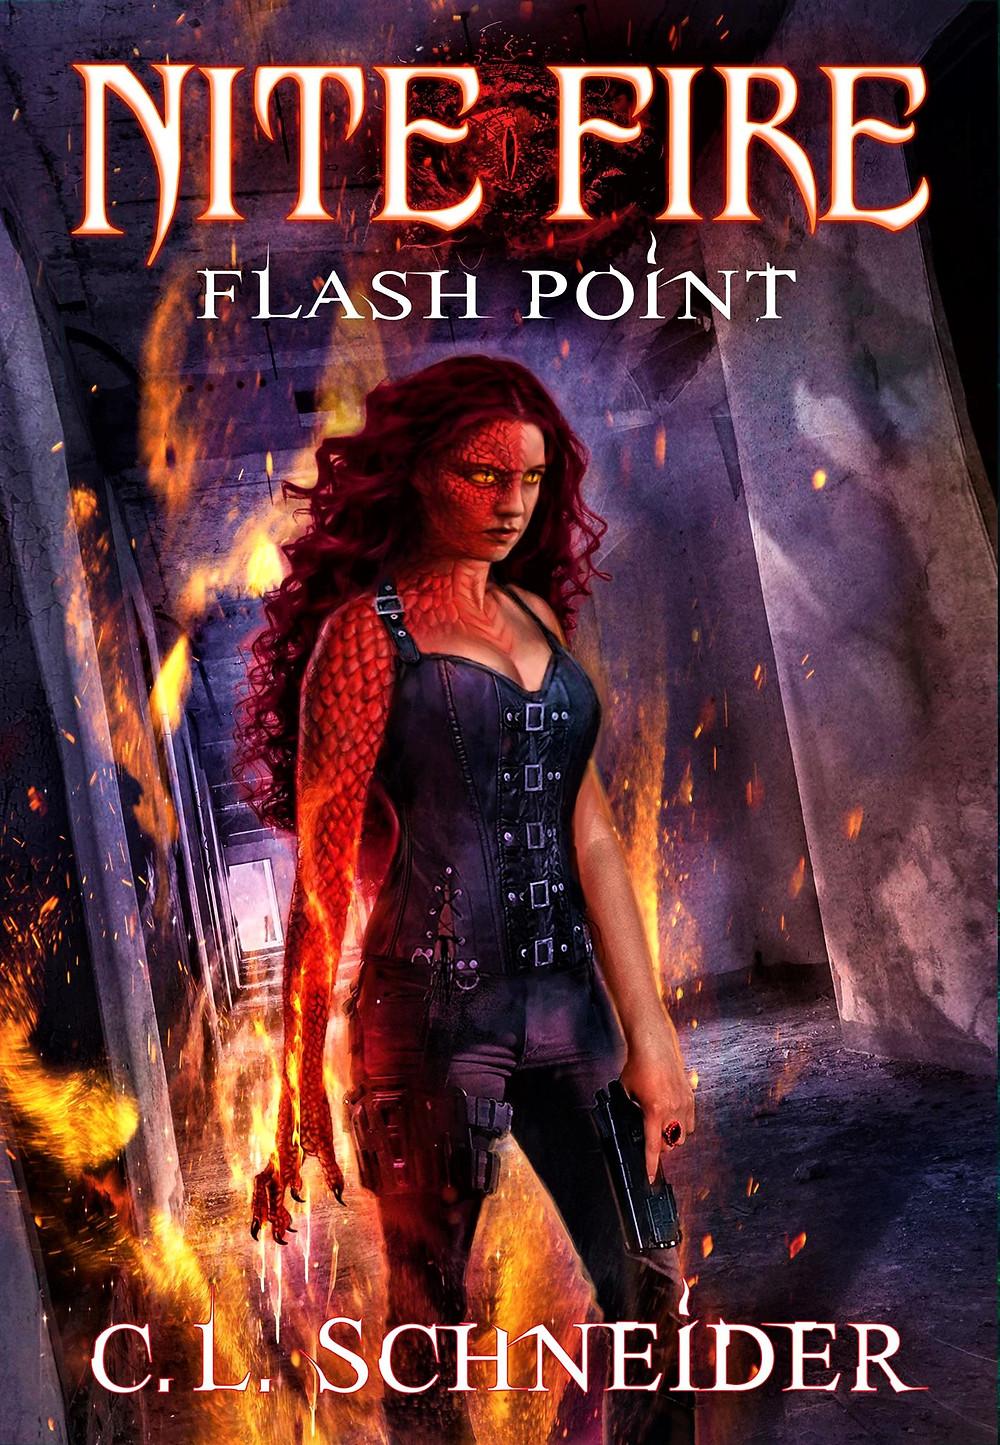 Book Review - Flash Point by C. L. Schneider